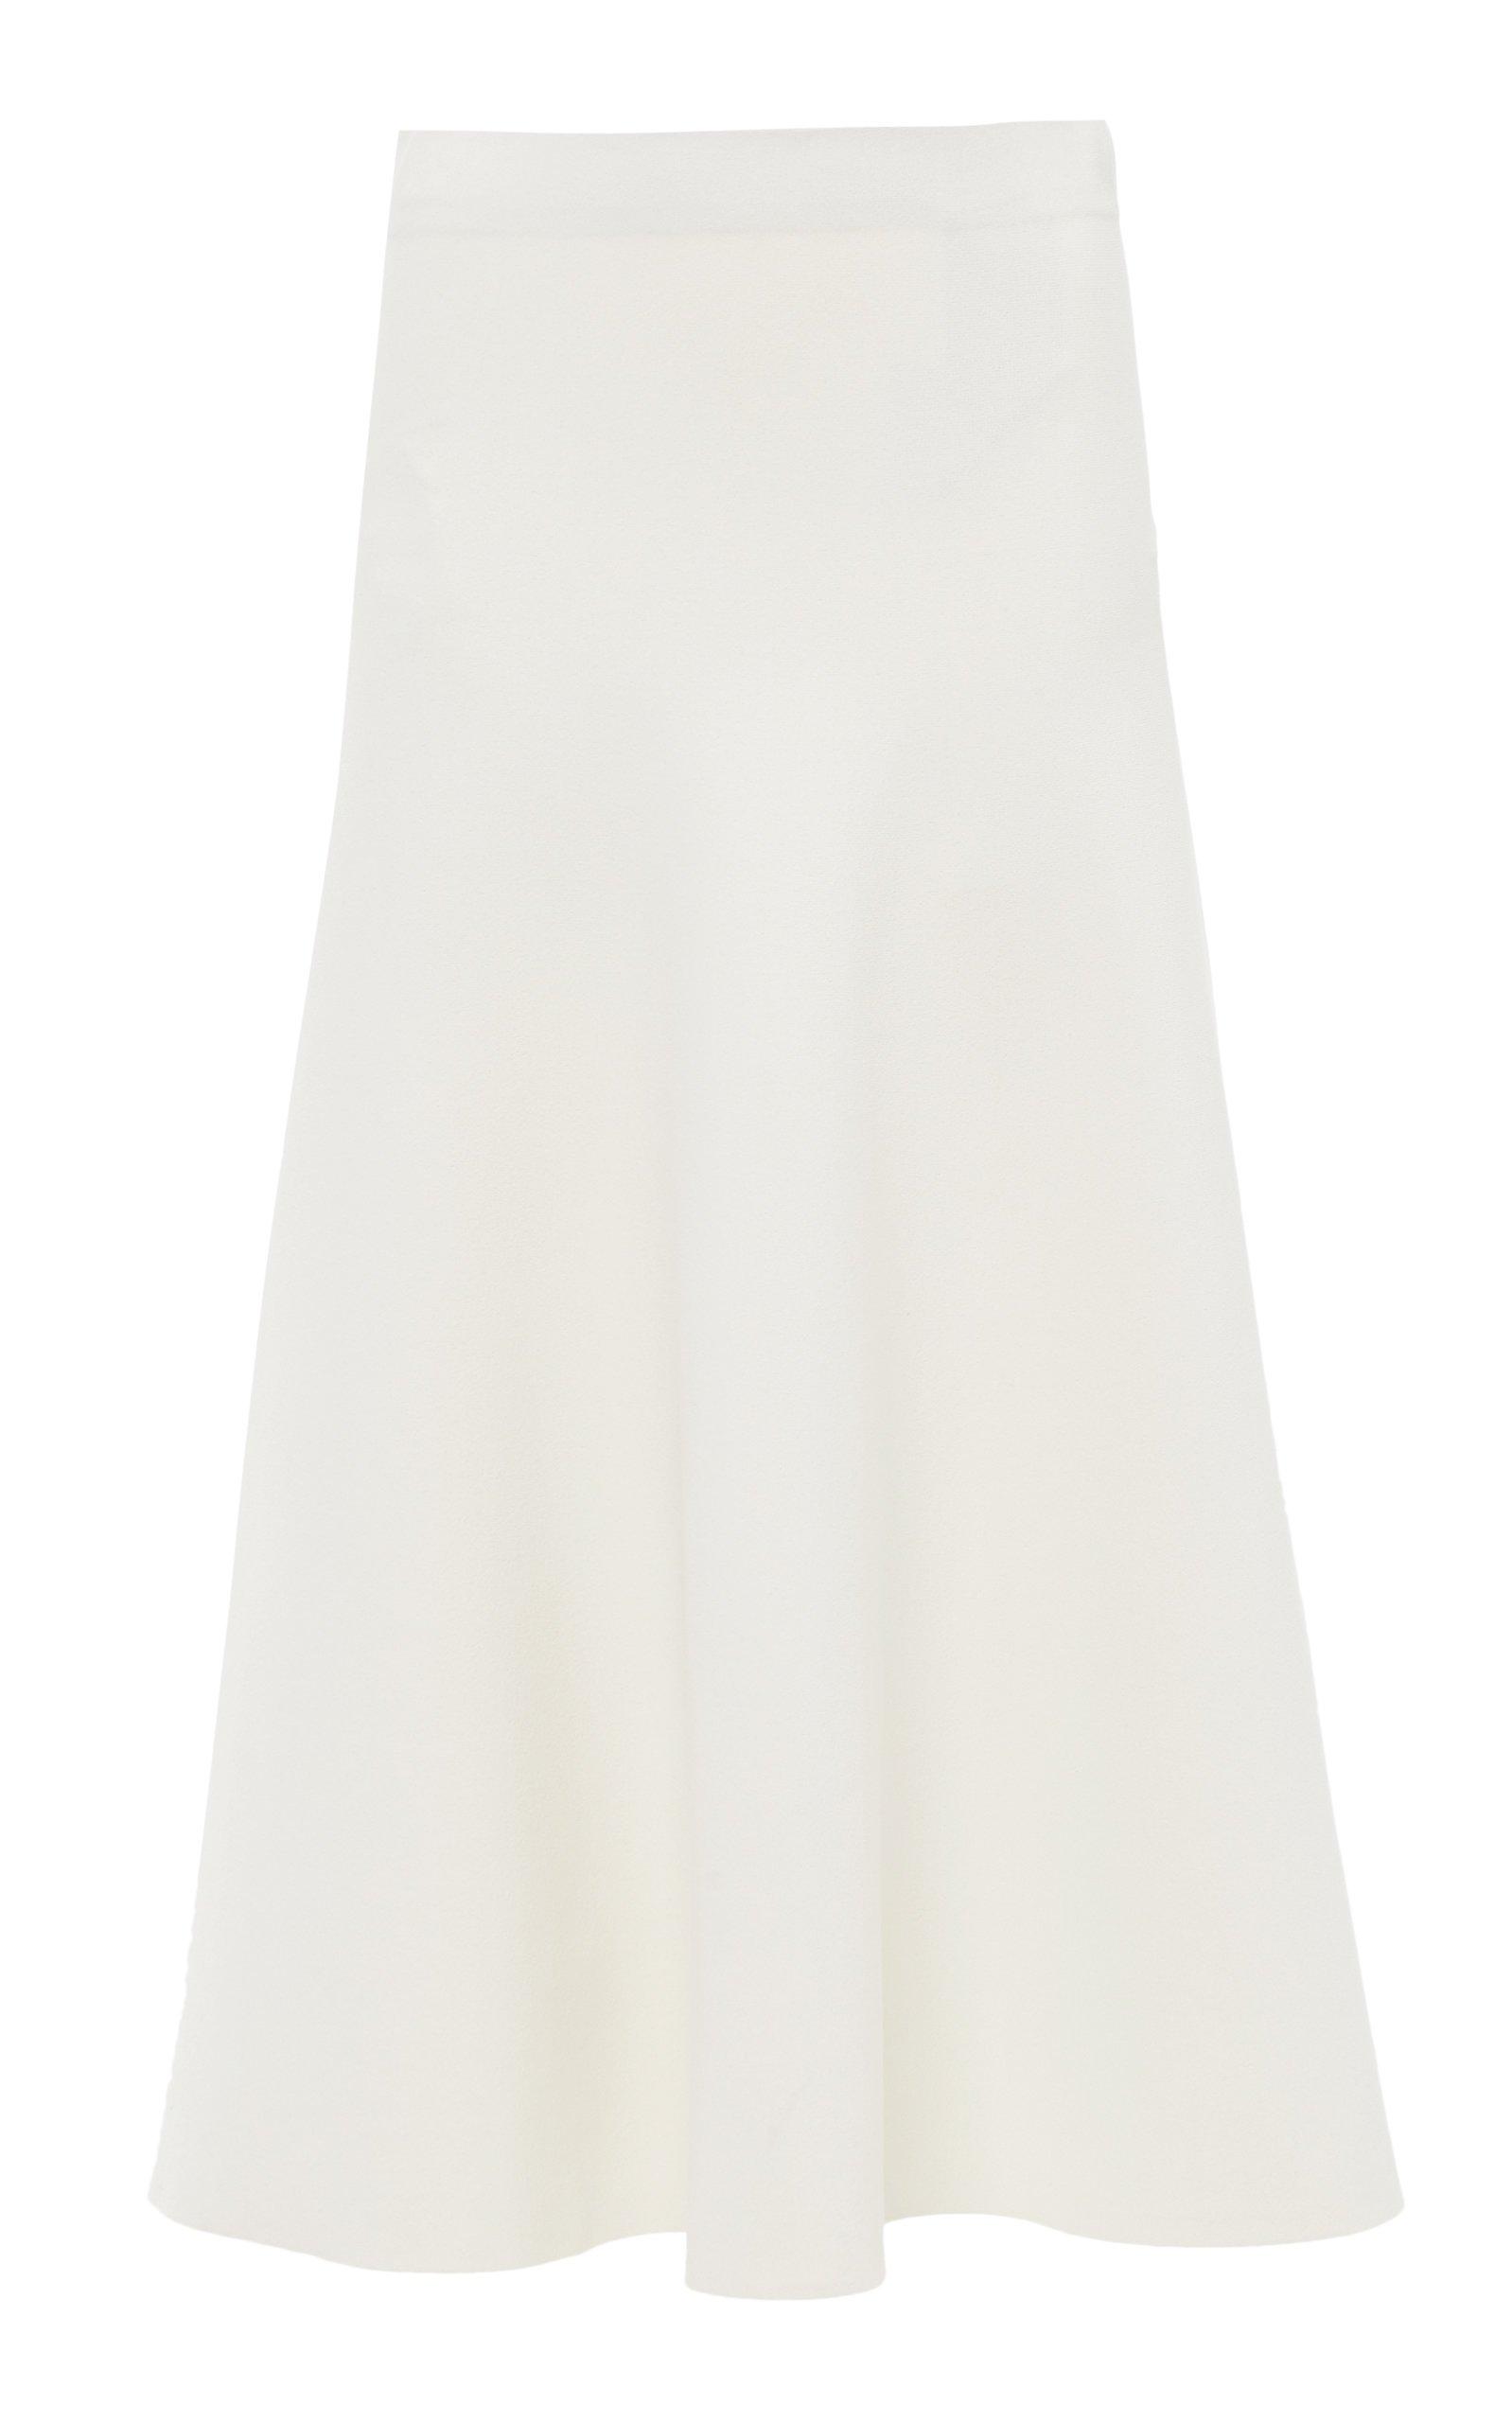 Jil Sander Crepe Midi Skirt Size: 42